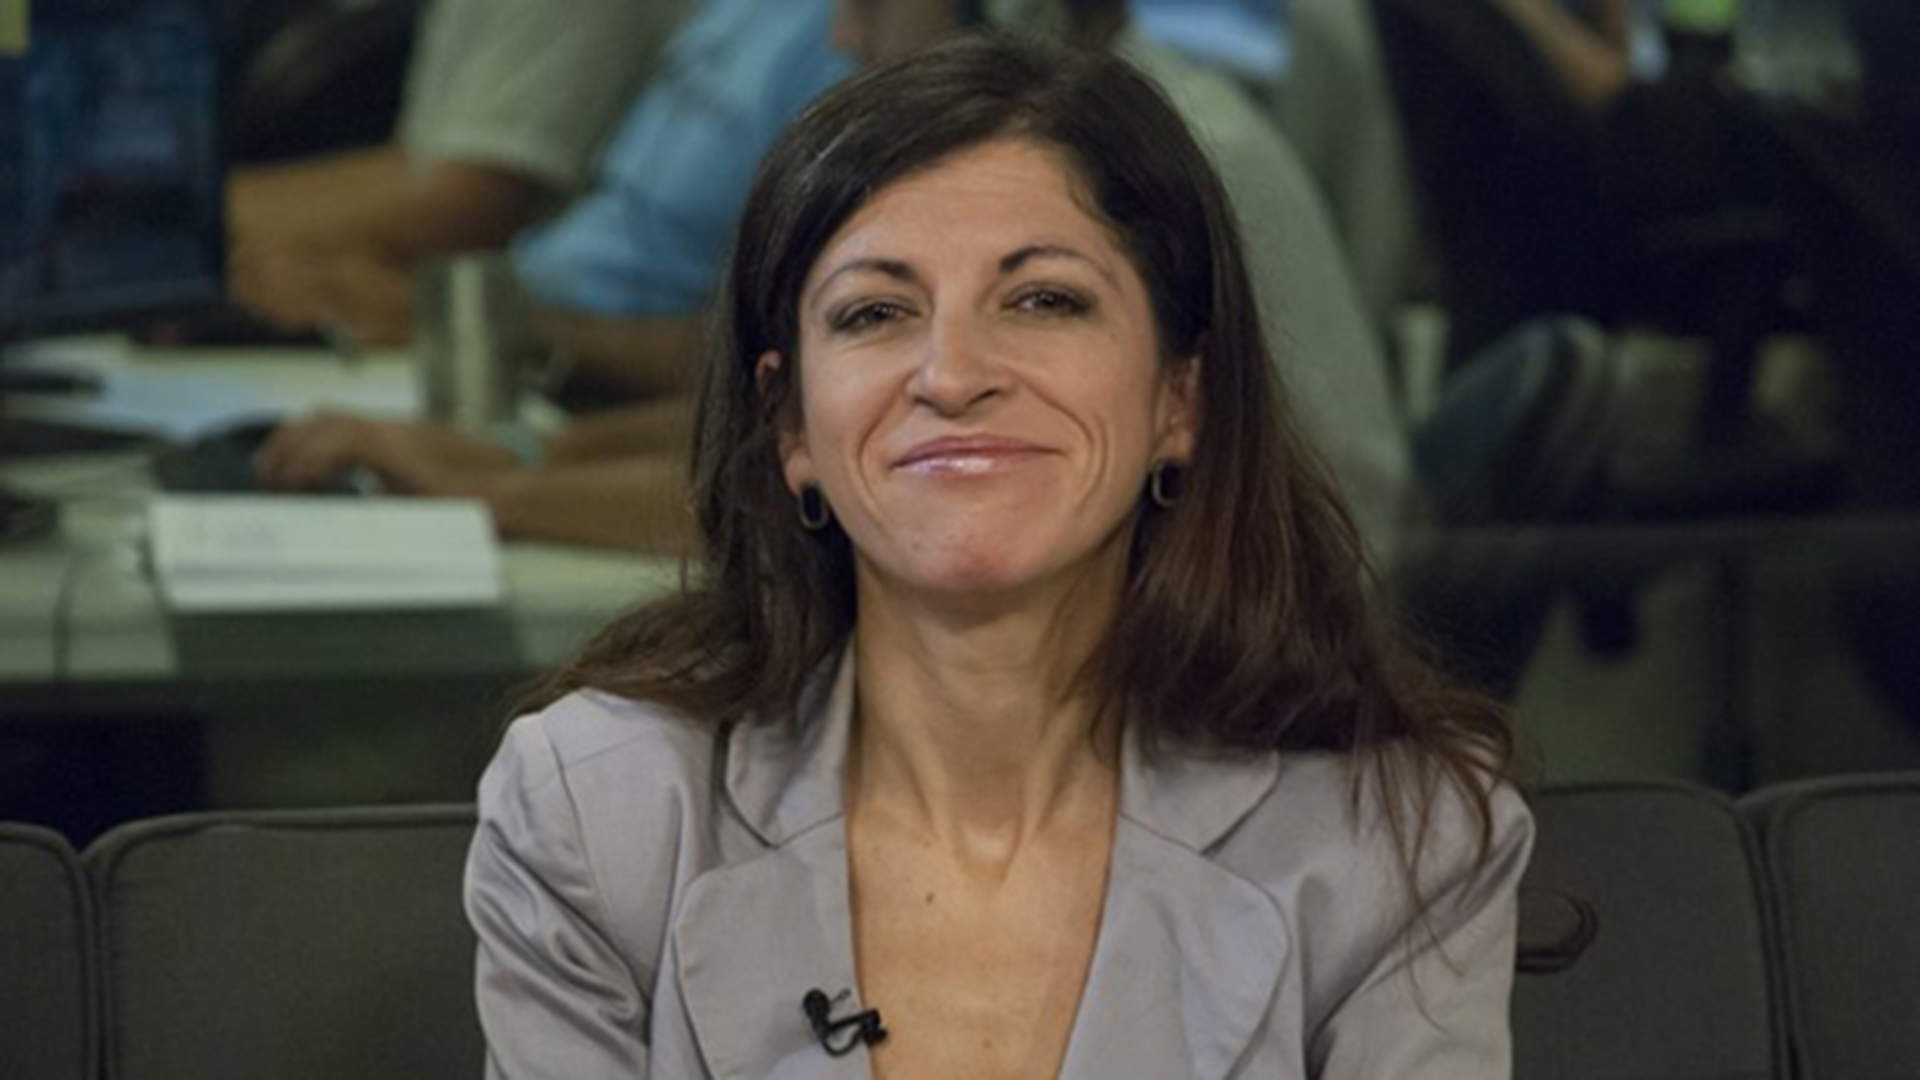 Cristina no votó y culpó a Aerolíneas